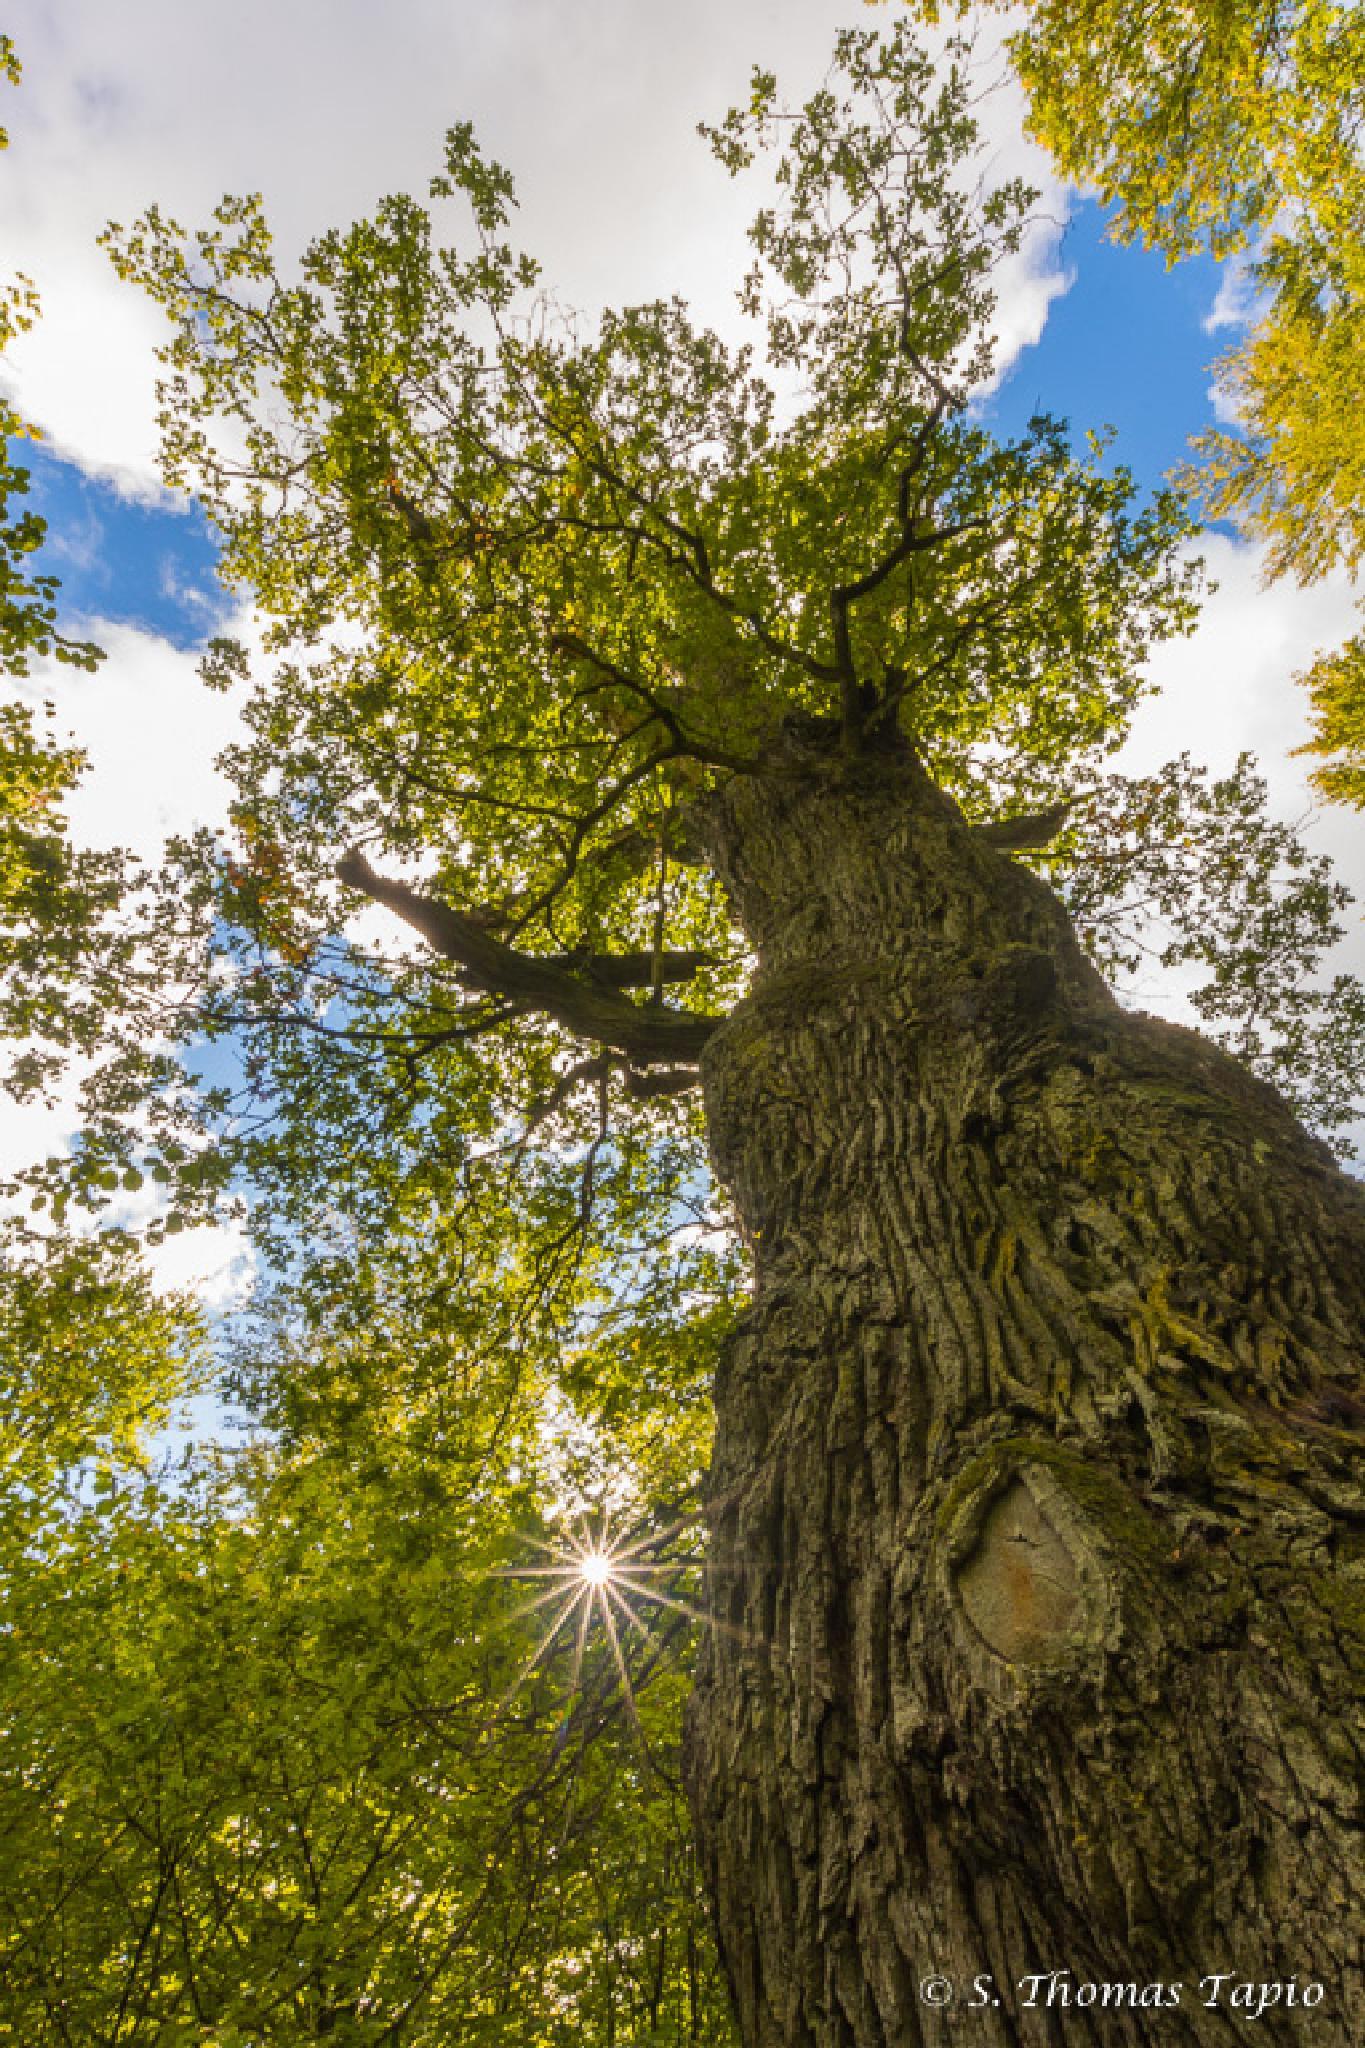 Wants old oak tree by Thomas Tapio